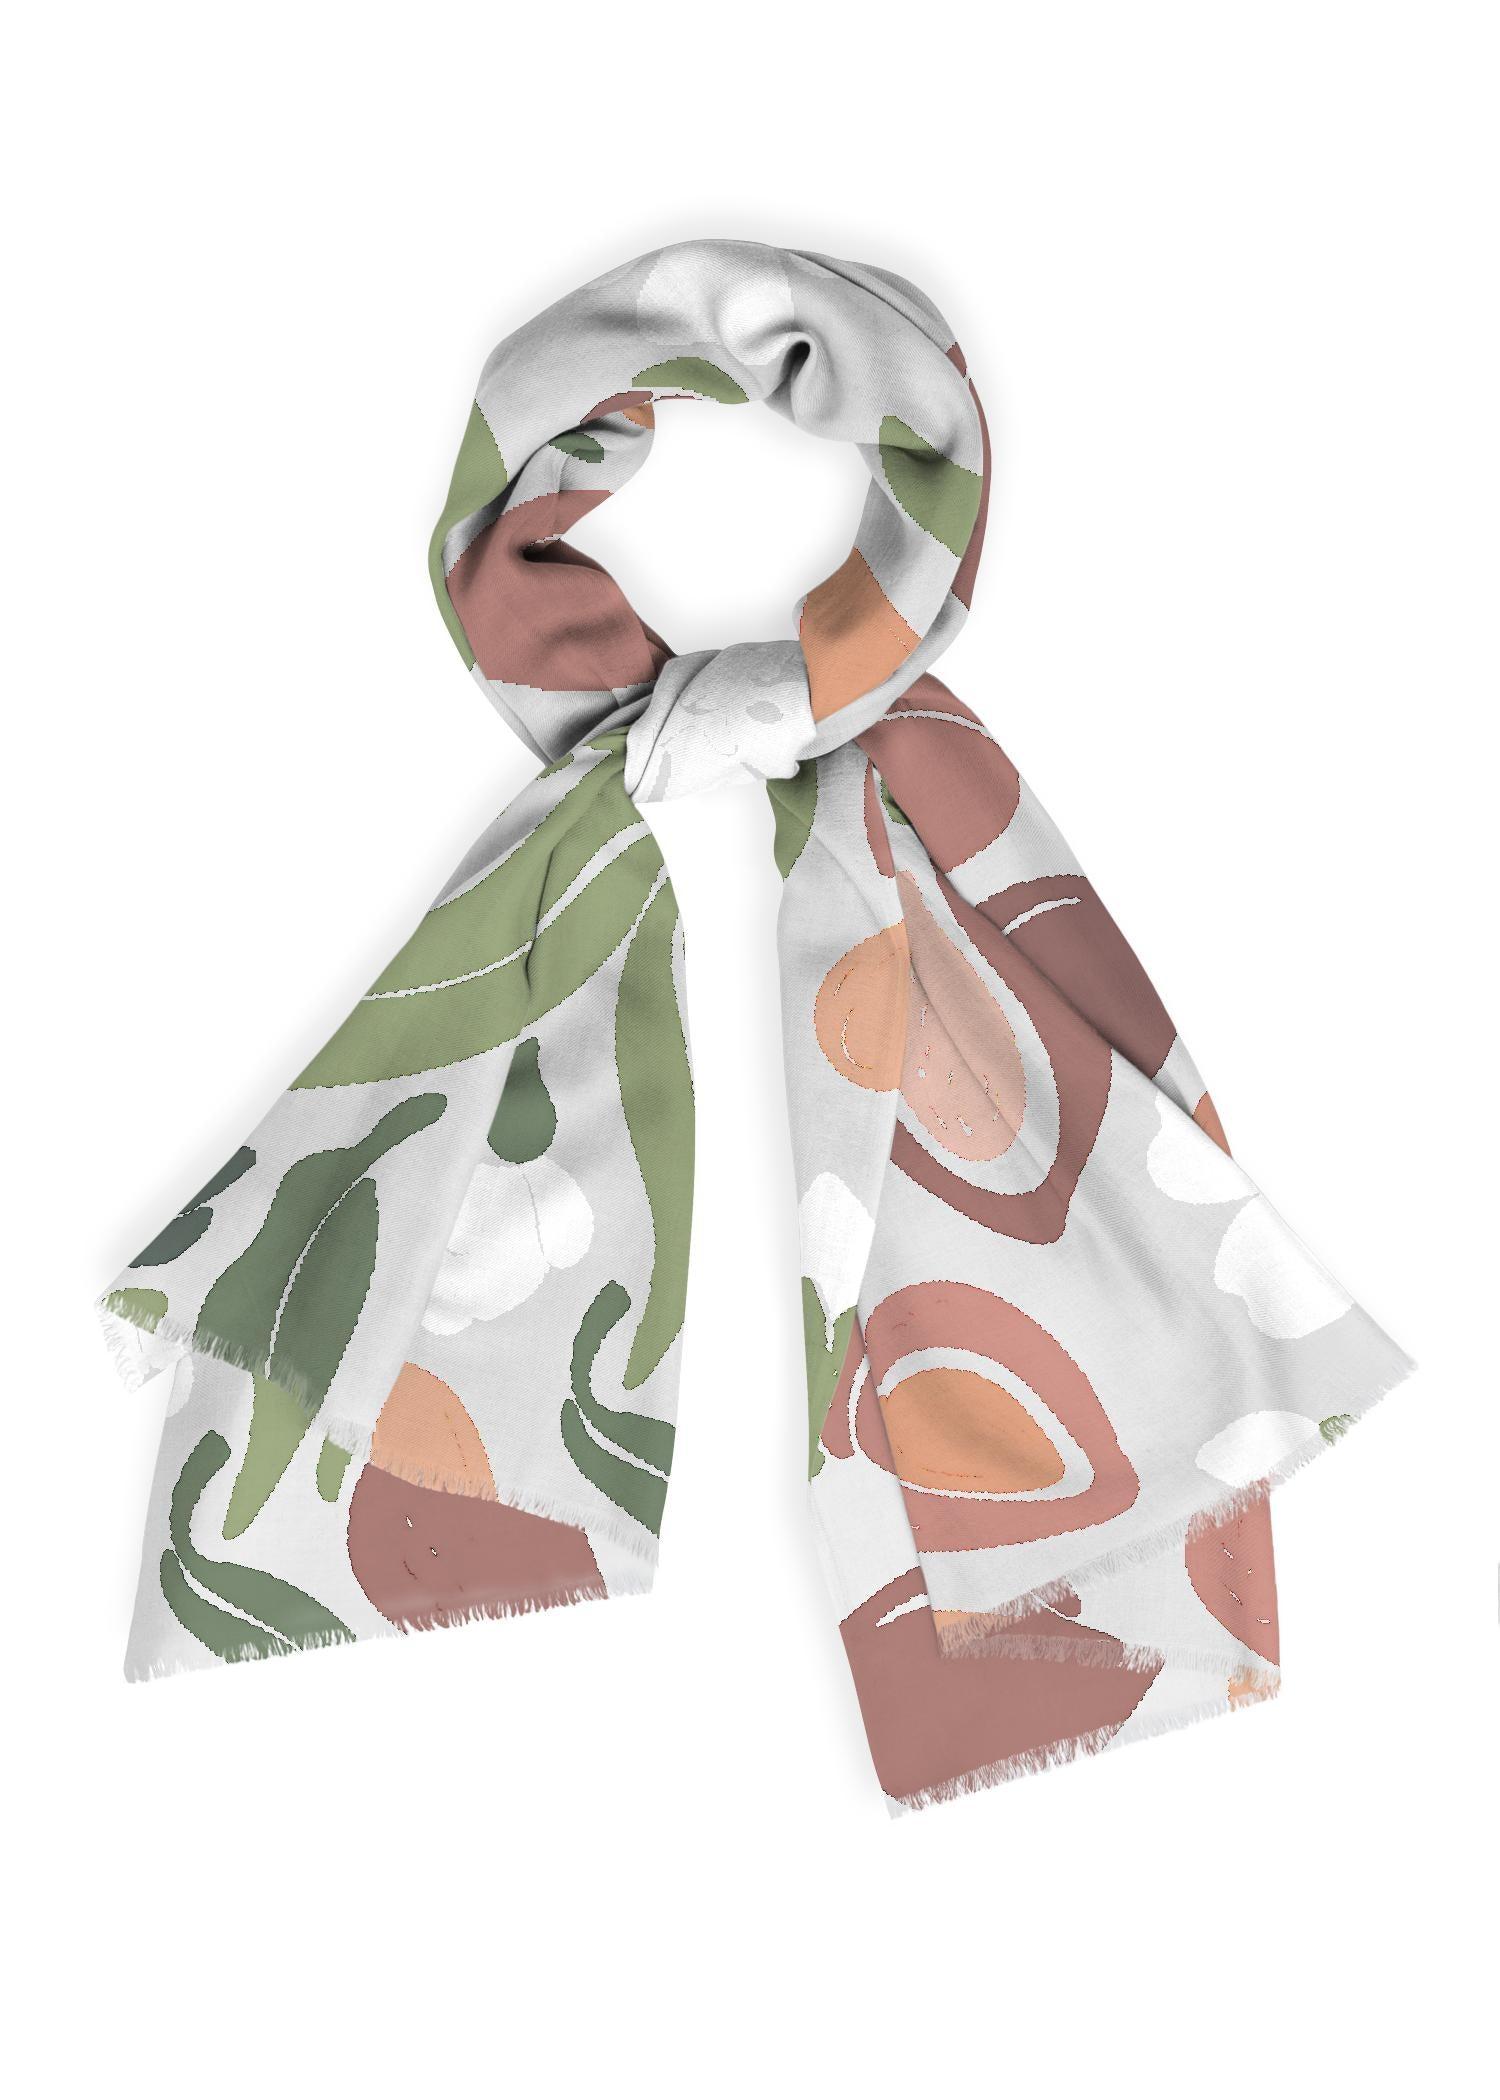 VIDA Cashmere Silk Scarf - Vintage Fashion Floral Ar in Brown/White by VIDA Original Artist  - Size: One Size